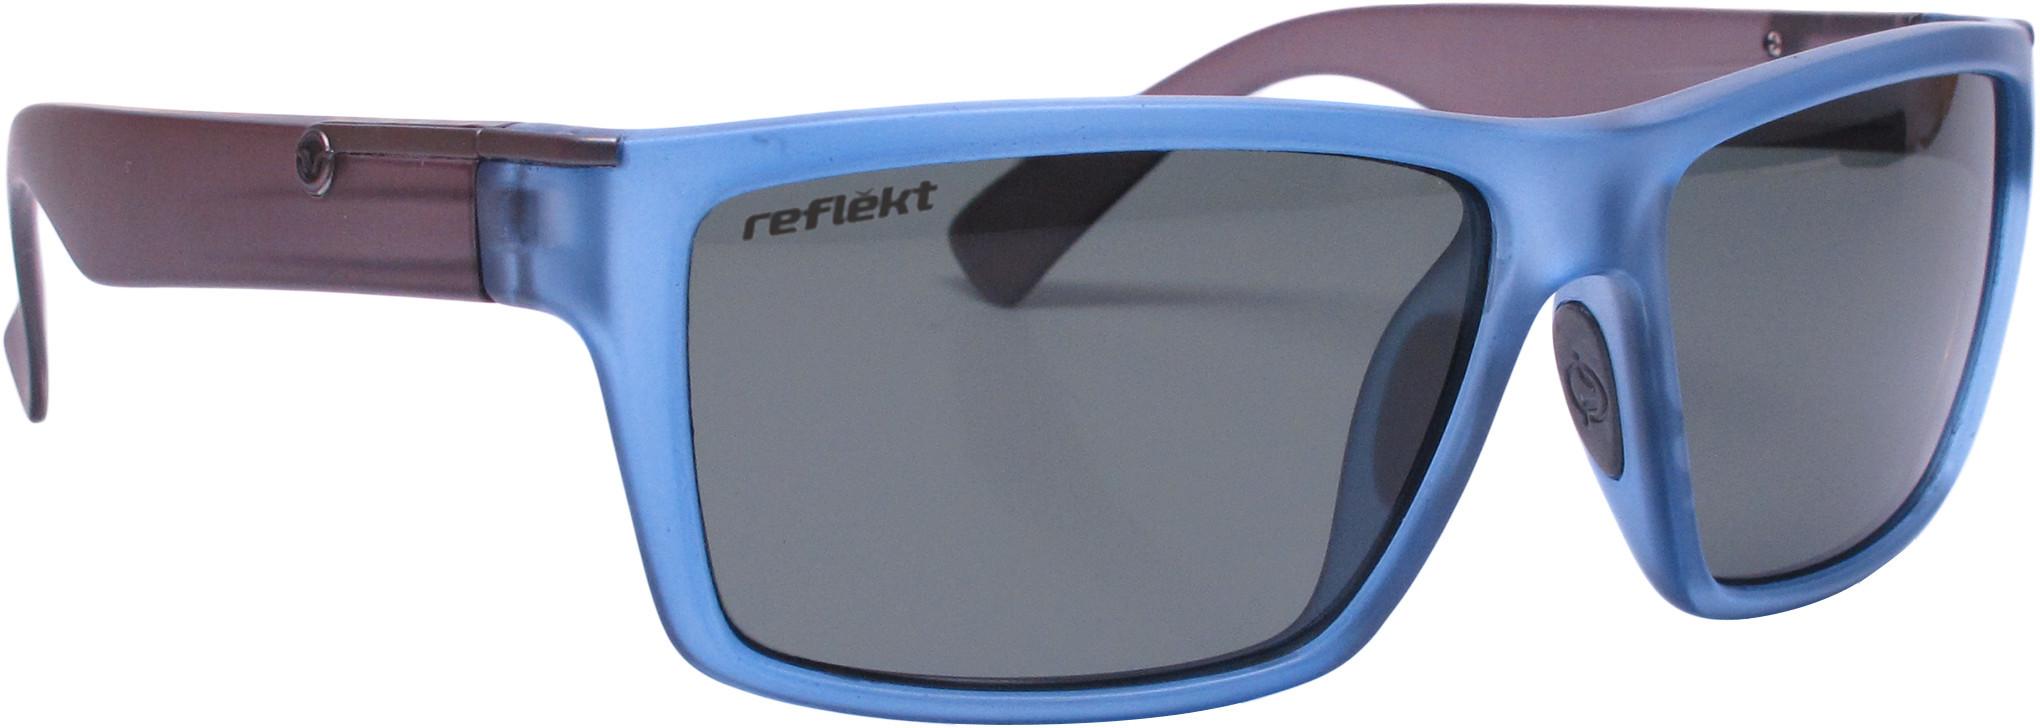 03e9c2c9ea56 Unsinkable Echo Sunglasses with Free S H — CampSaver